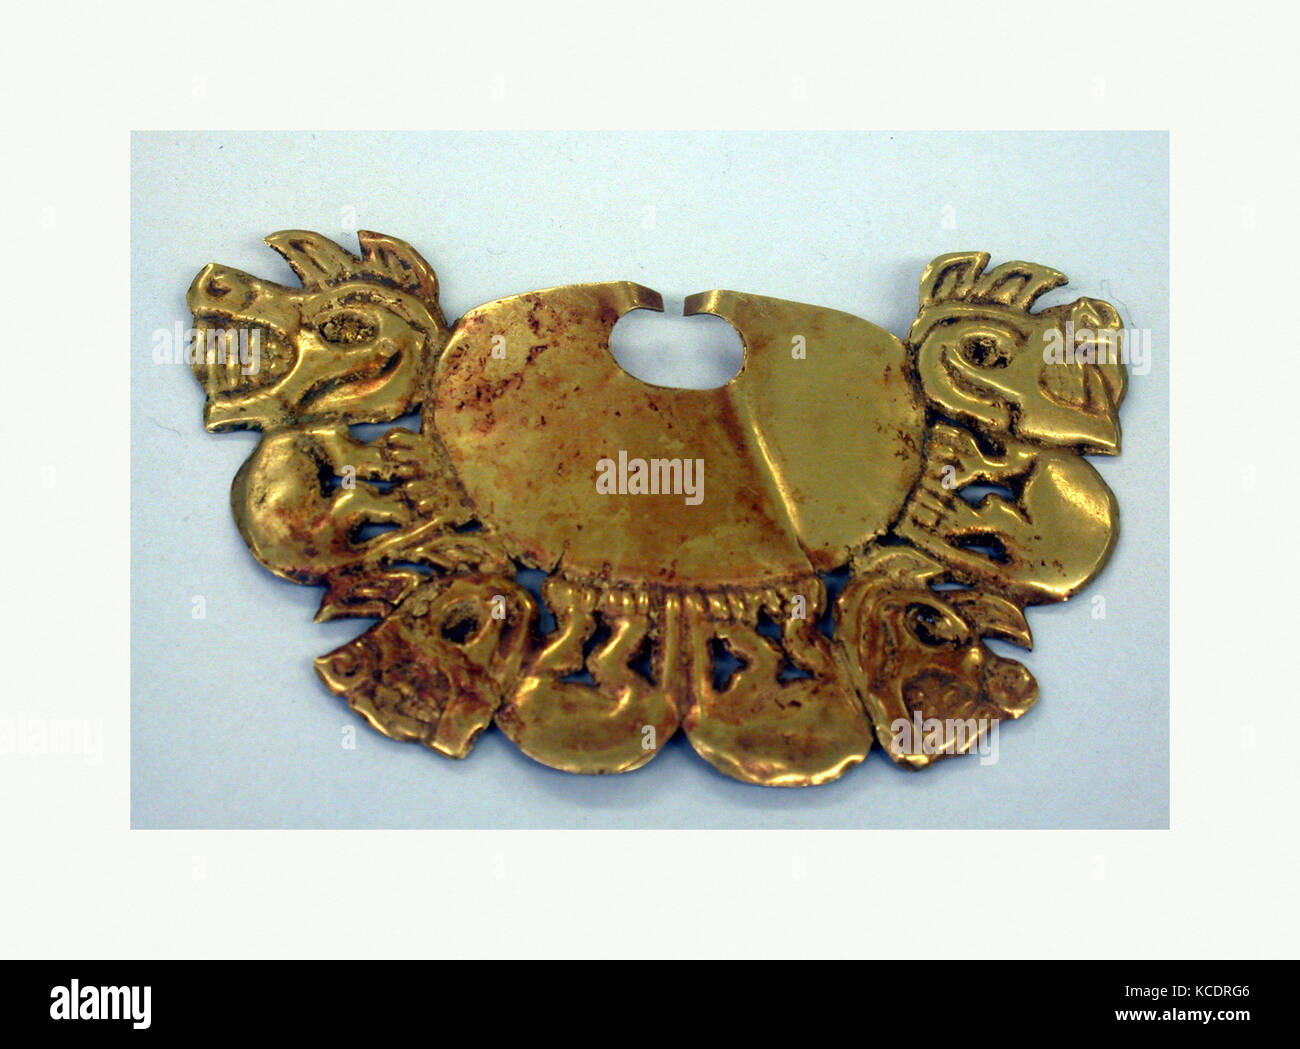 Nose Ornament, 390–450, Peru, Moche (Loma Negra), Gold, H. 1 7/8 x W. 2 7/8 x D. 1/4 in. (4.8 x 7.3 x 0.6 cm), Metal - Stock Image